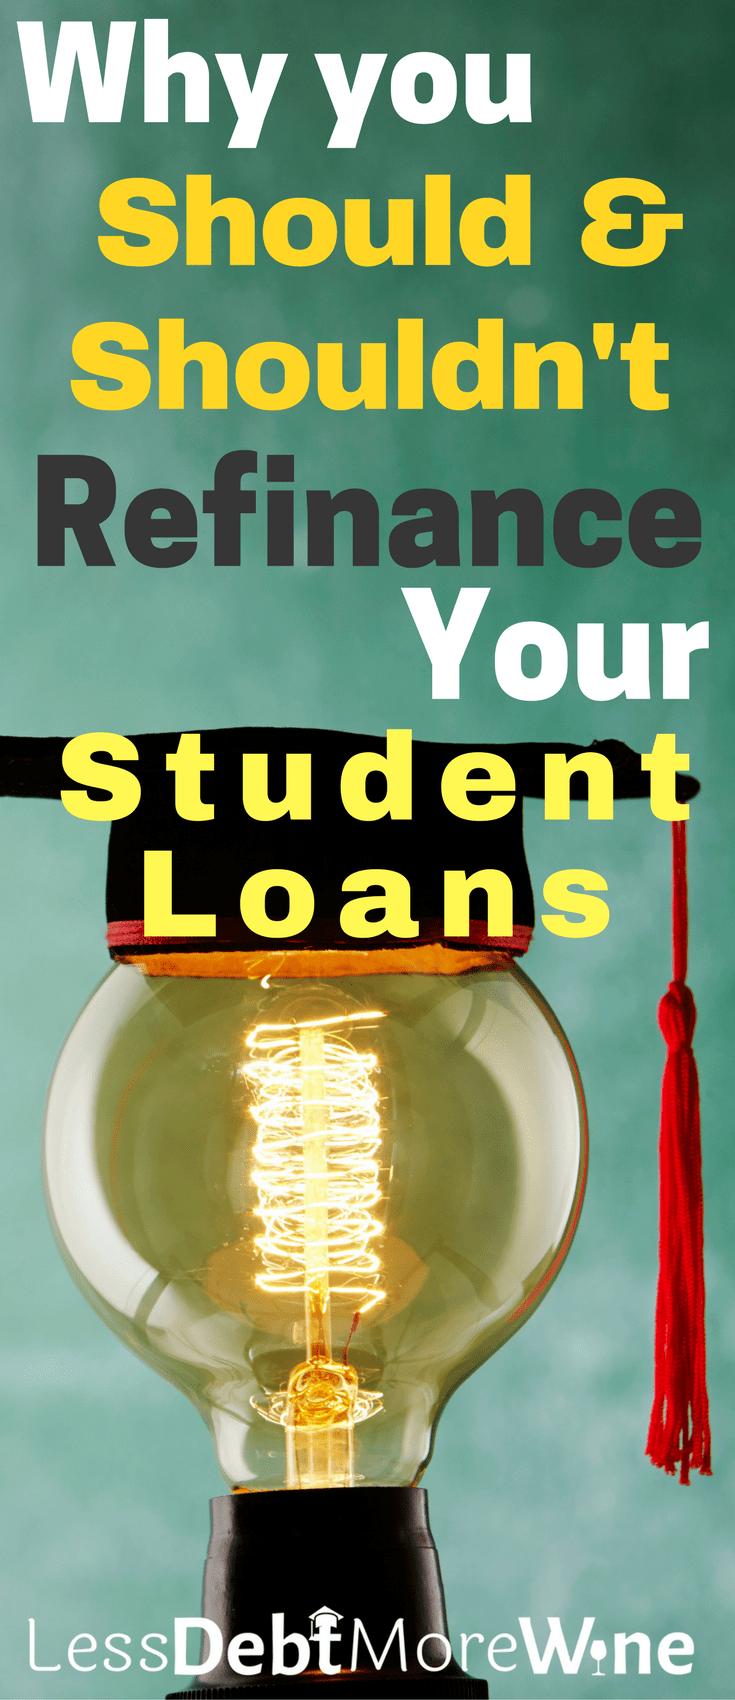 student loan debt | pay off debt | debt repayment | student debt | millennial money tips | student loan refinancing | refinance with SoFi